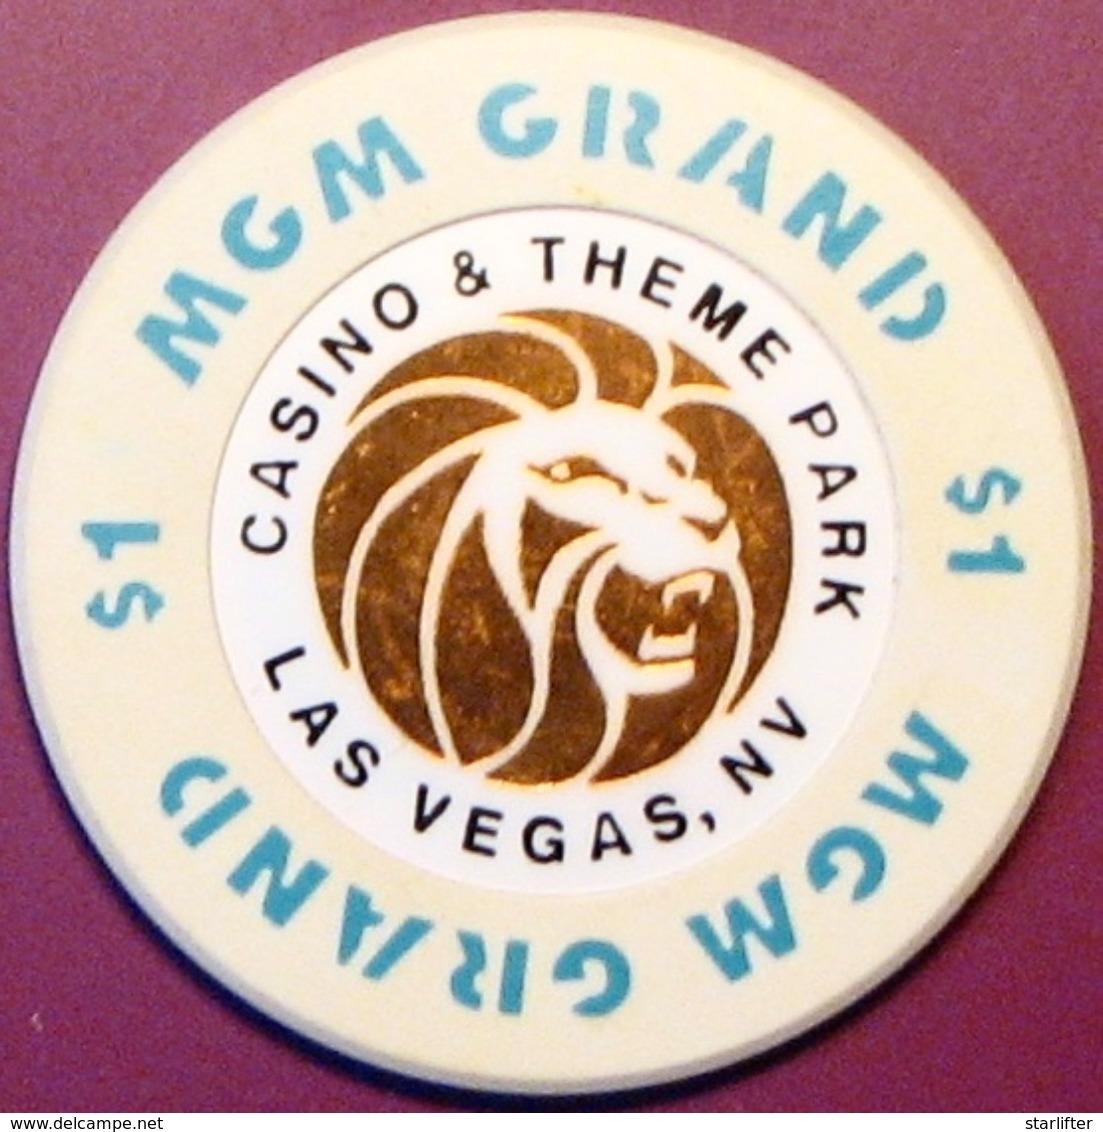 $1 Casino Chip. MGM Grand, Las Vegas, NV. M11. - Casino